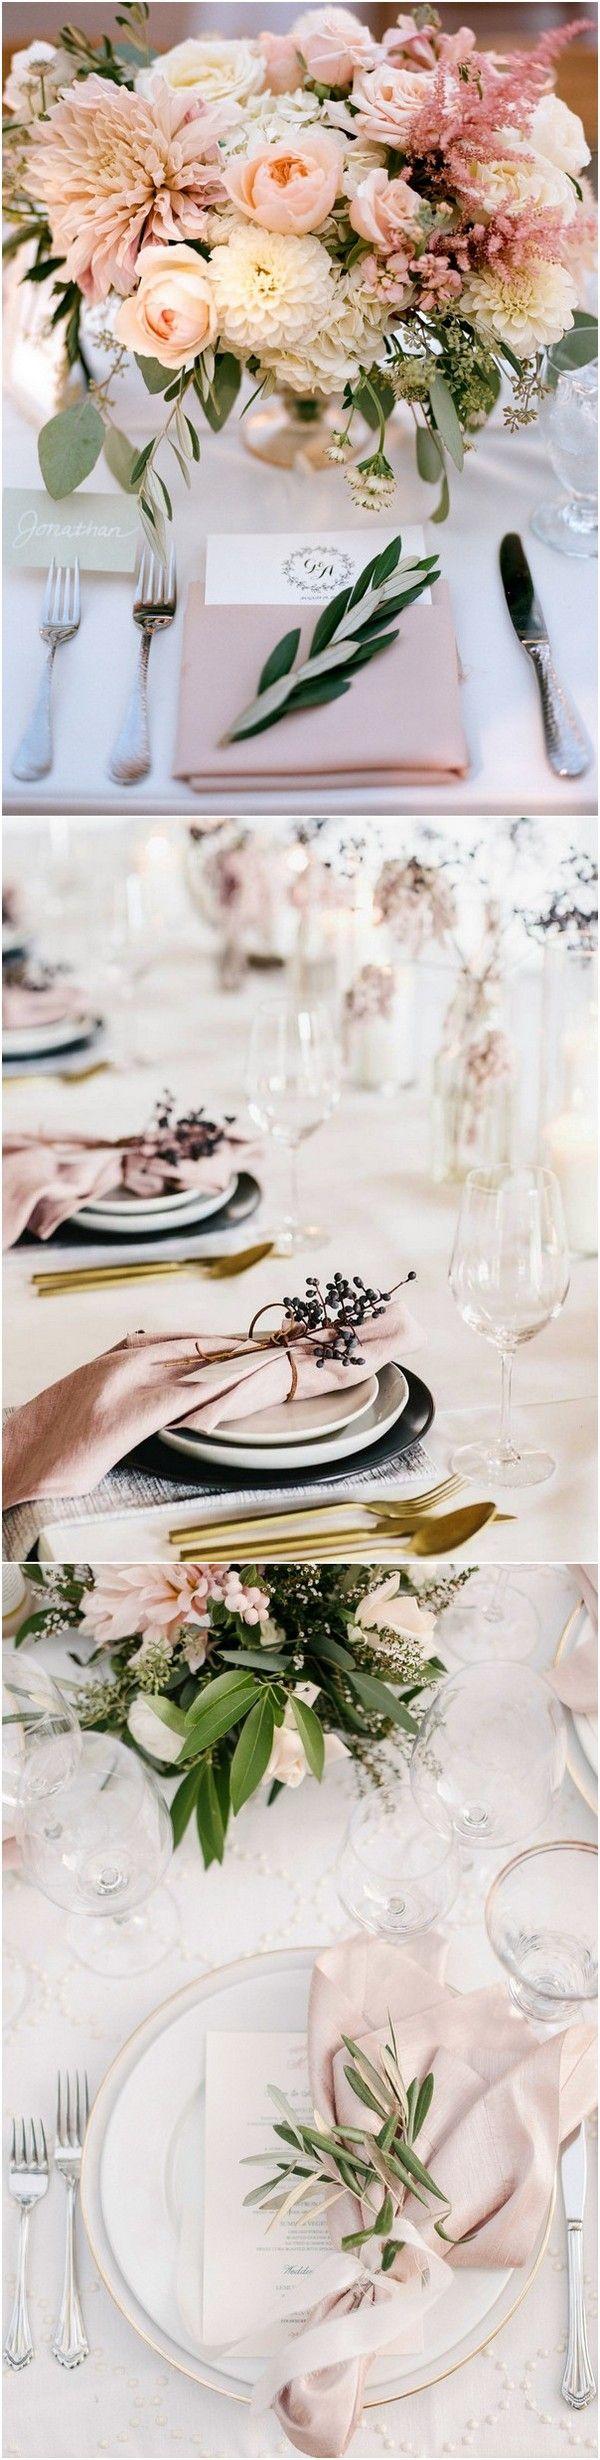 Wedding decorations dusty blue december 2018  best Wedding images on Pinterest  Autumn Autumn weddings and